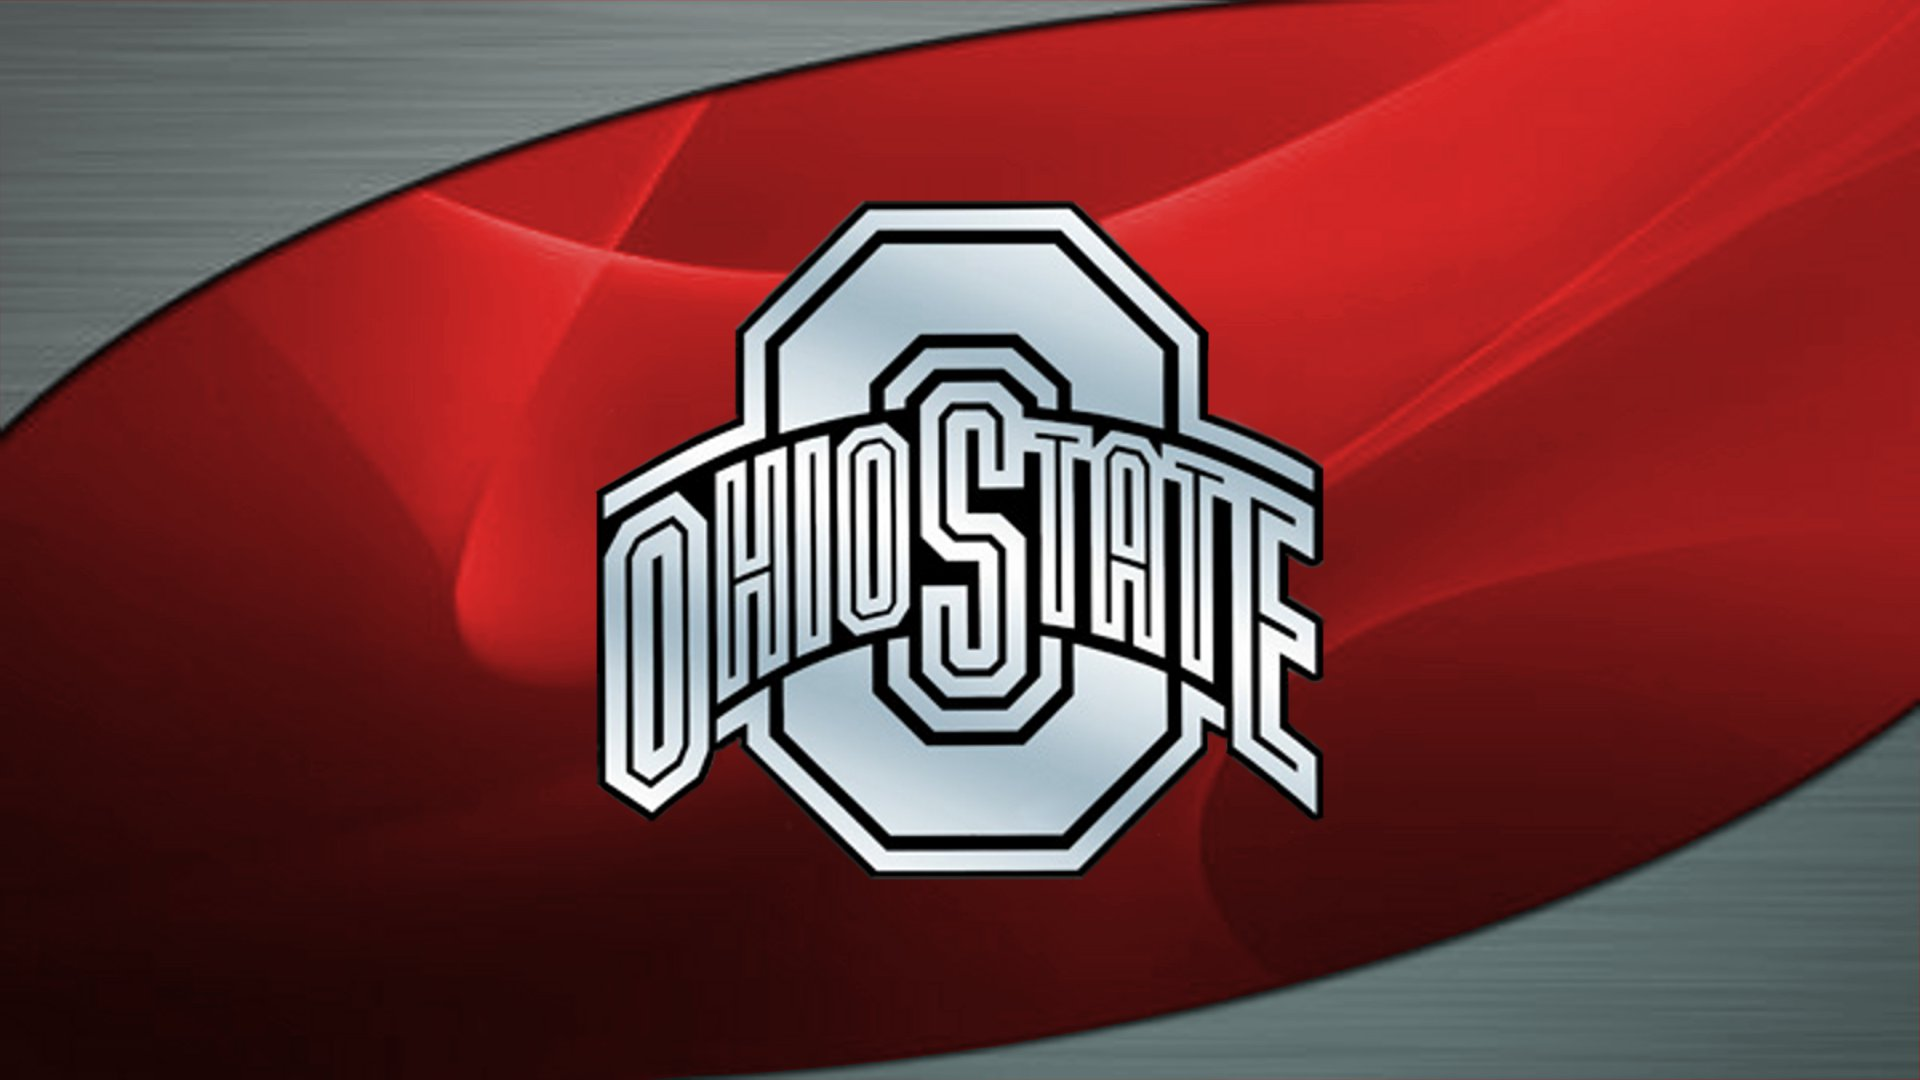 OSU Wallpaper 45 - Ohio State Football Wallpaper (29249112) - Fanpop